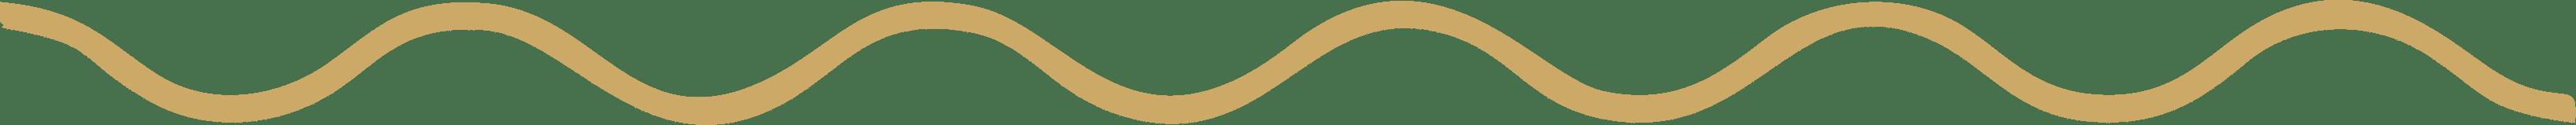 Ares do Campo - Granja Faria